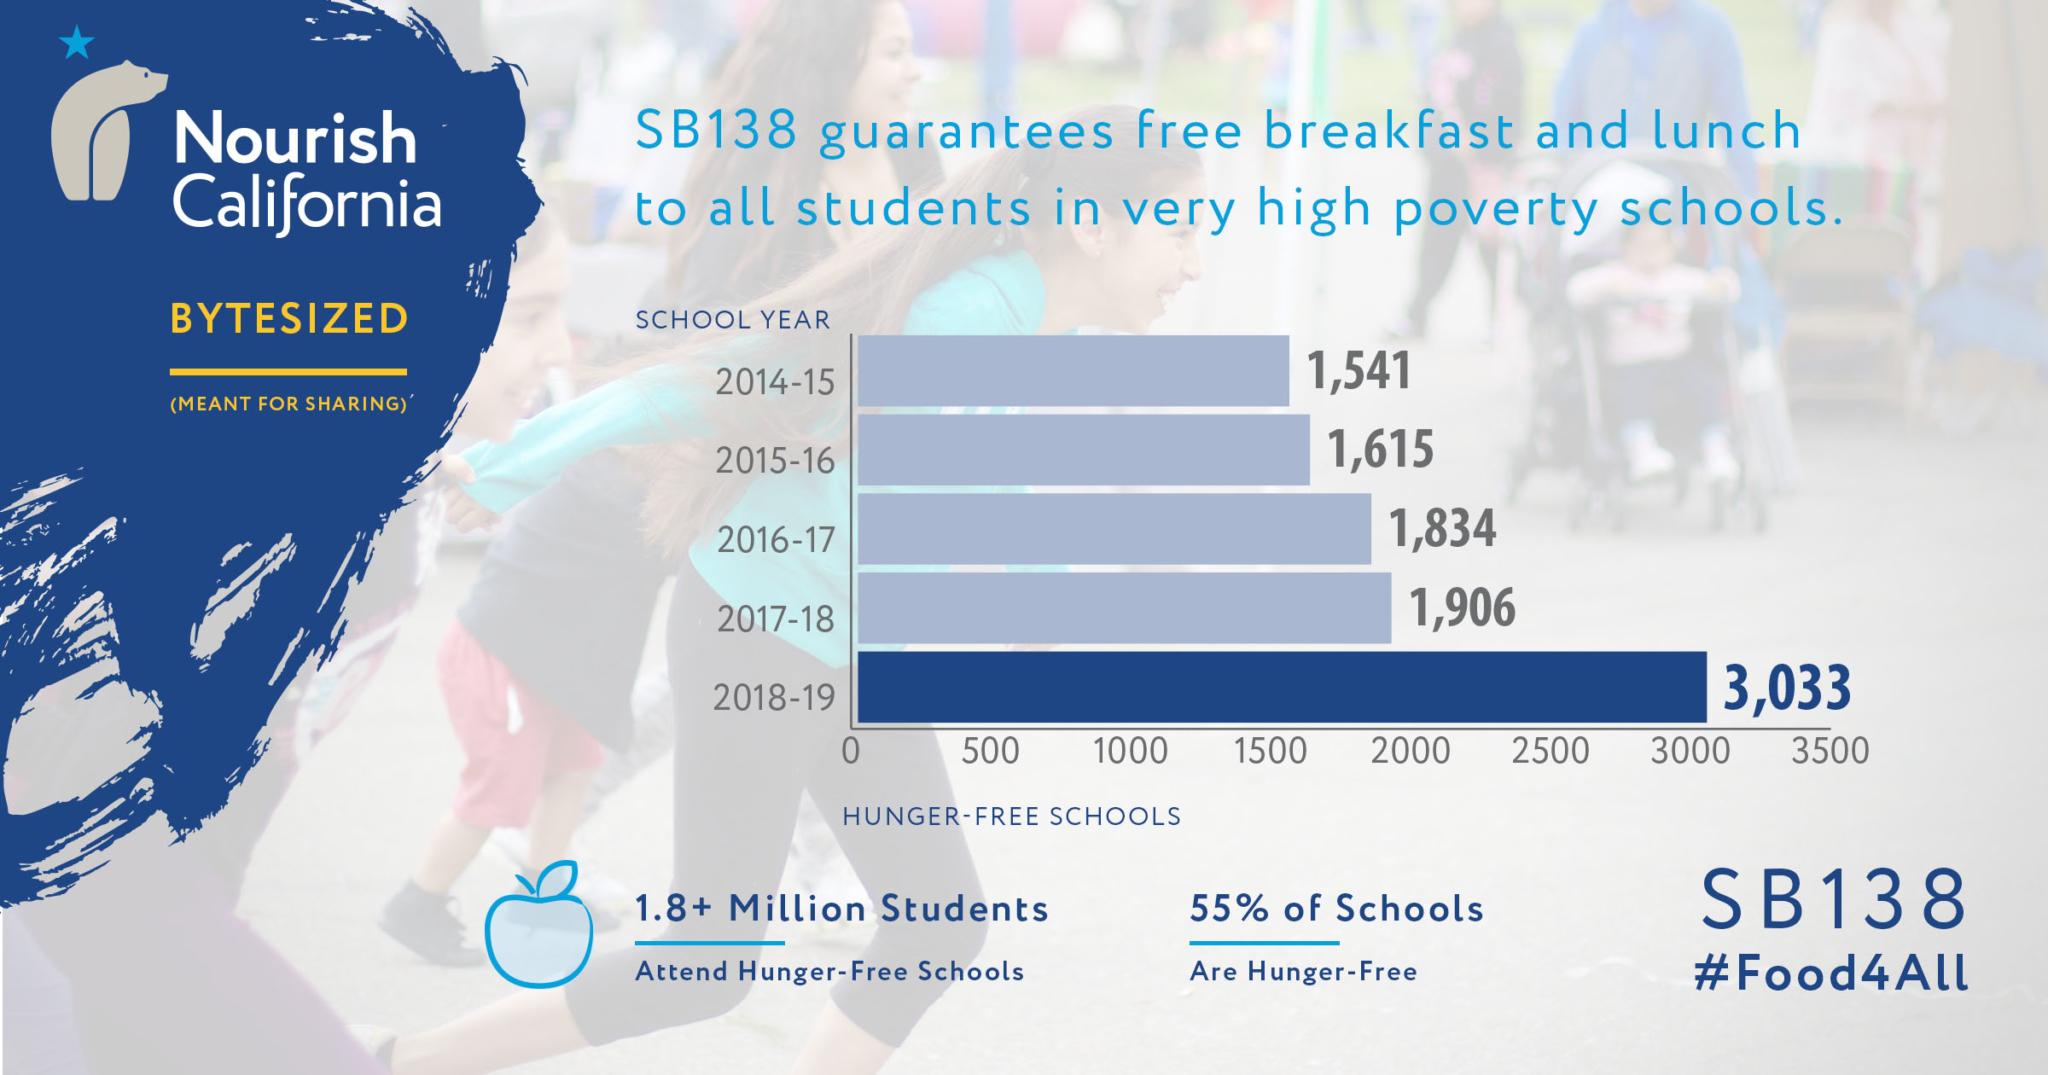 NCA-Template-Social-Media-hunger-free-schools